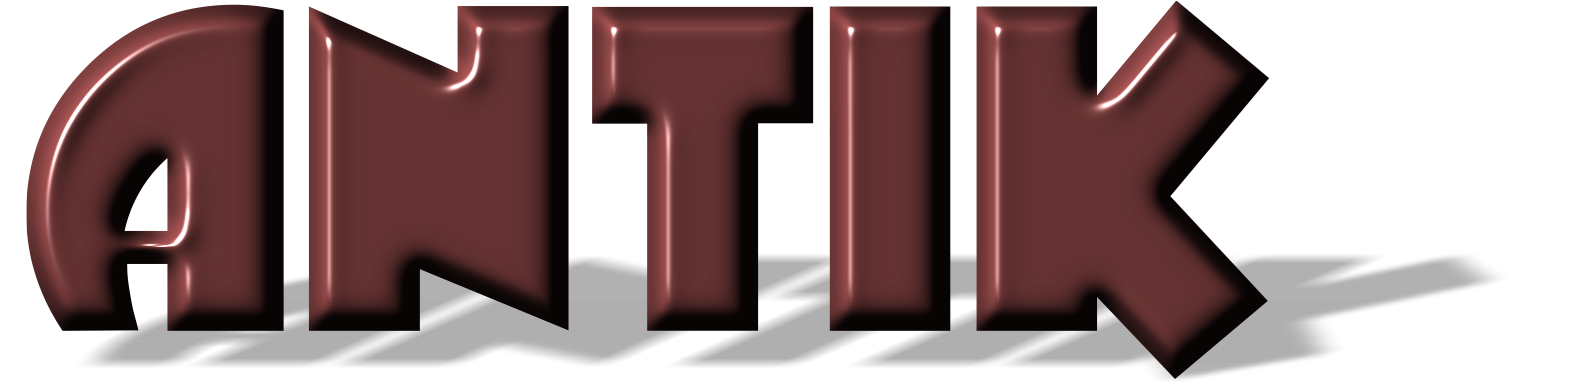 Membuat Text 3D dengan CorelDRAW | Belajar CorelDRAW